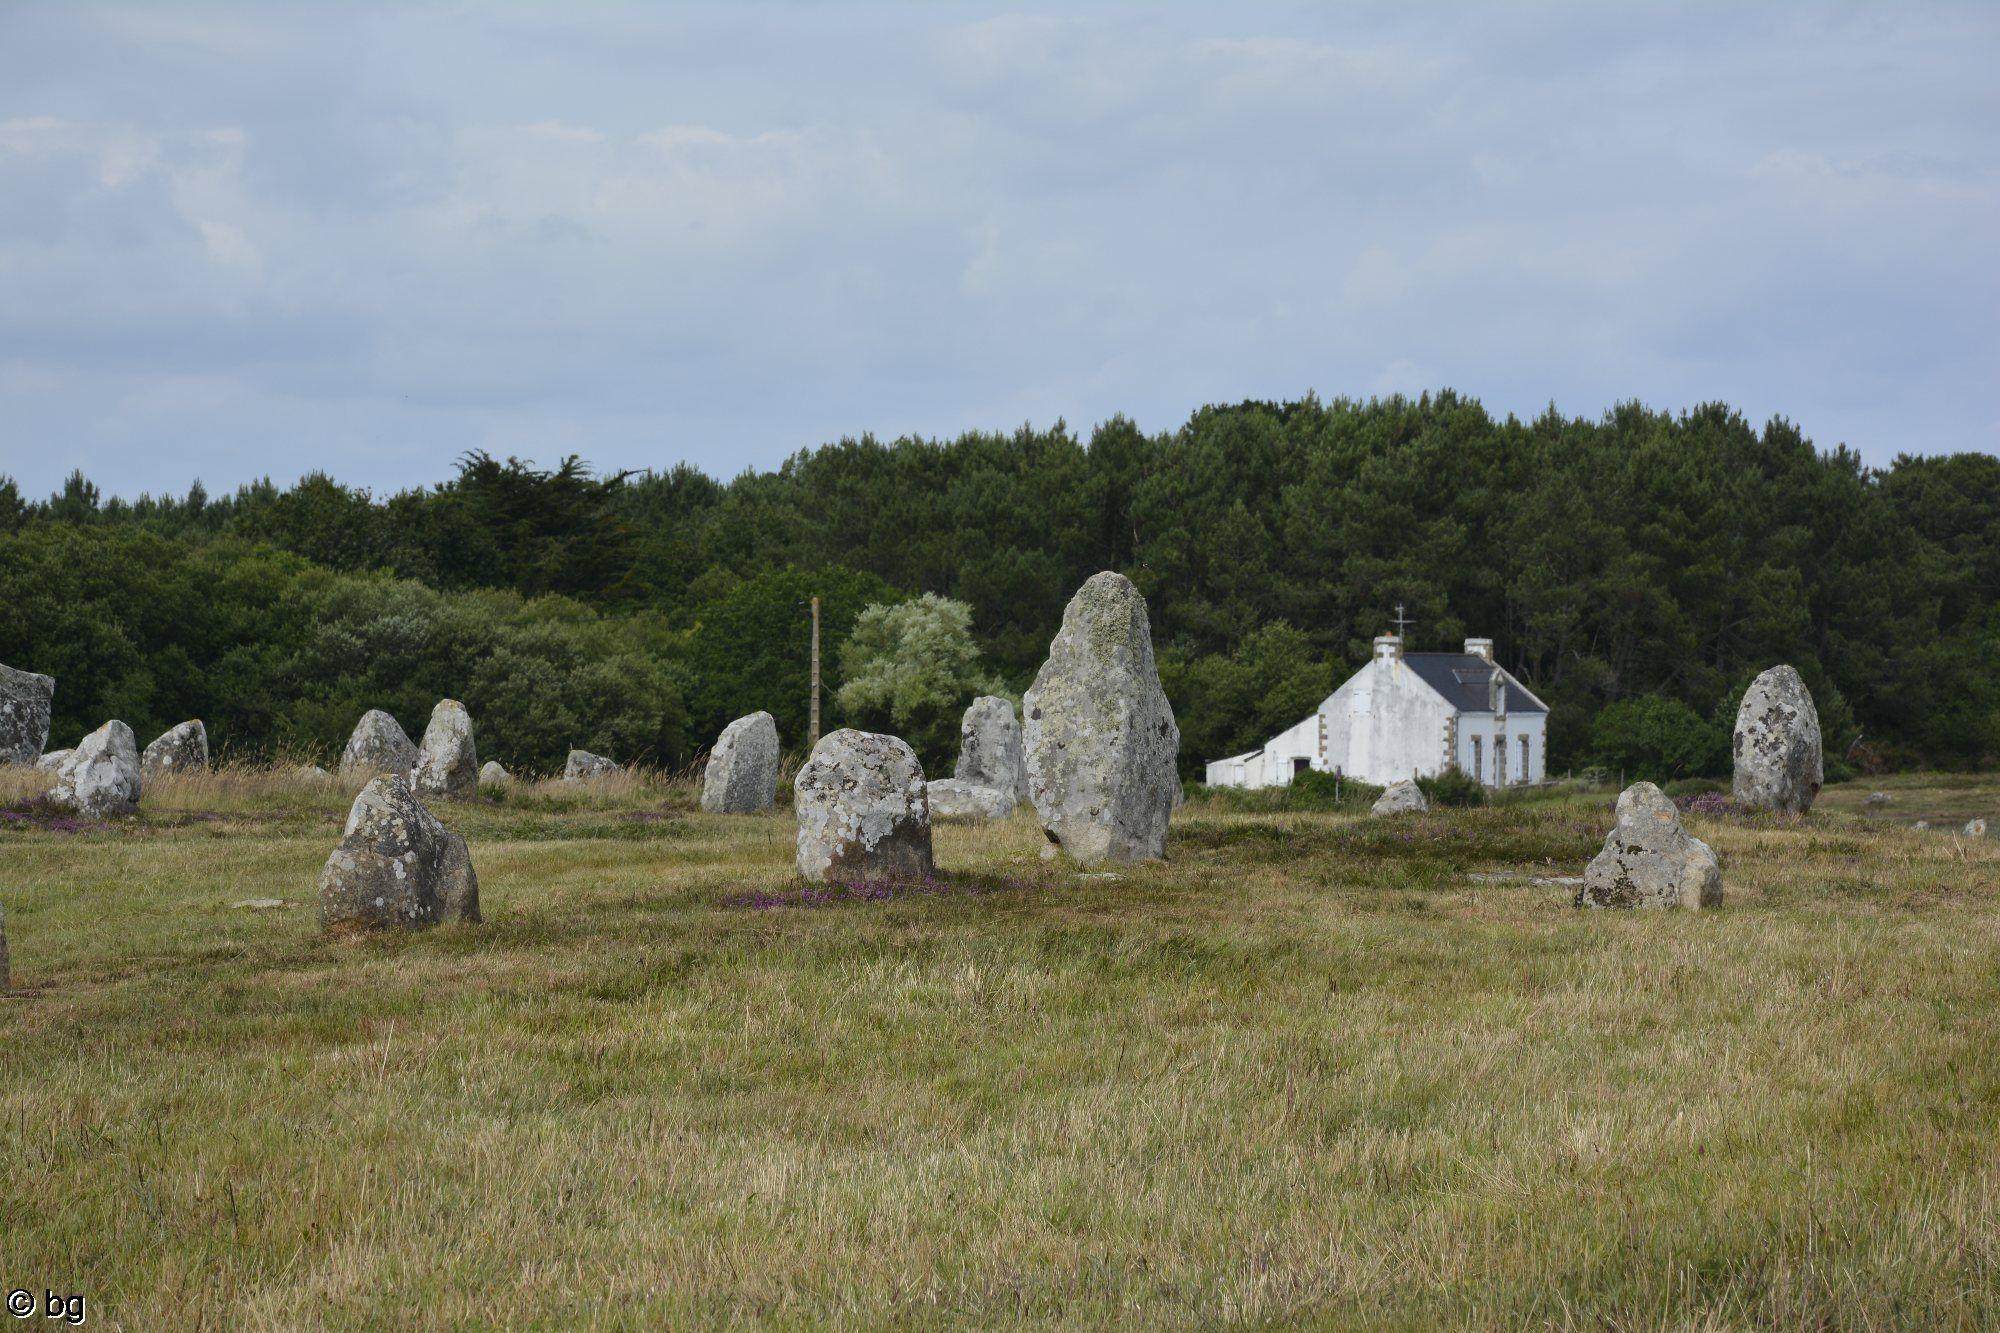 alignements-megalithiques-carnac-bgretagne-1